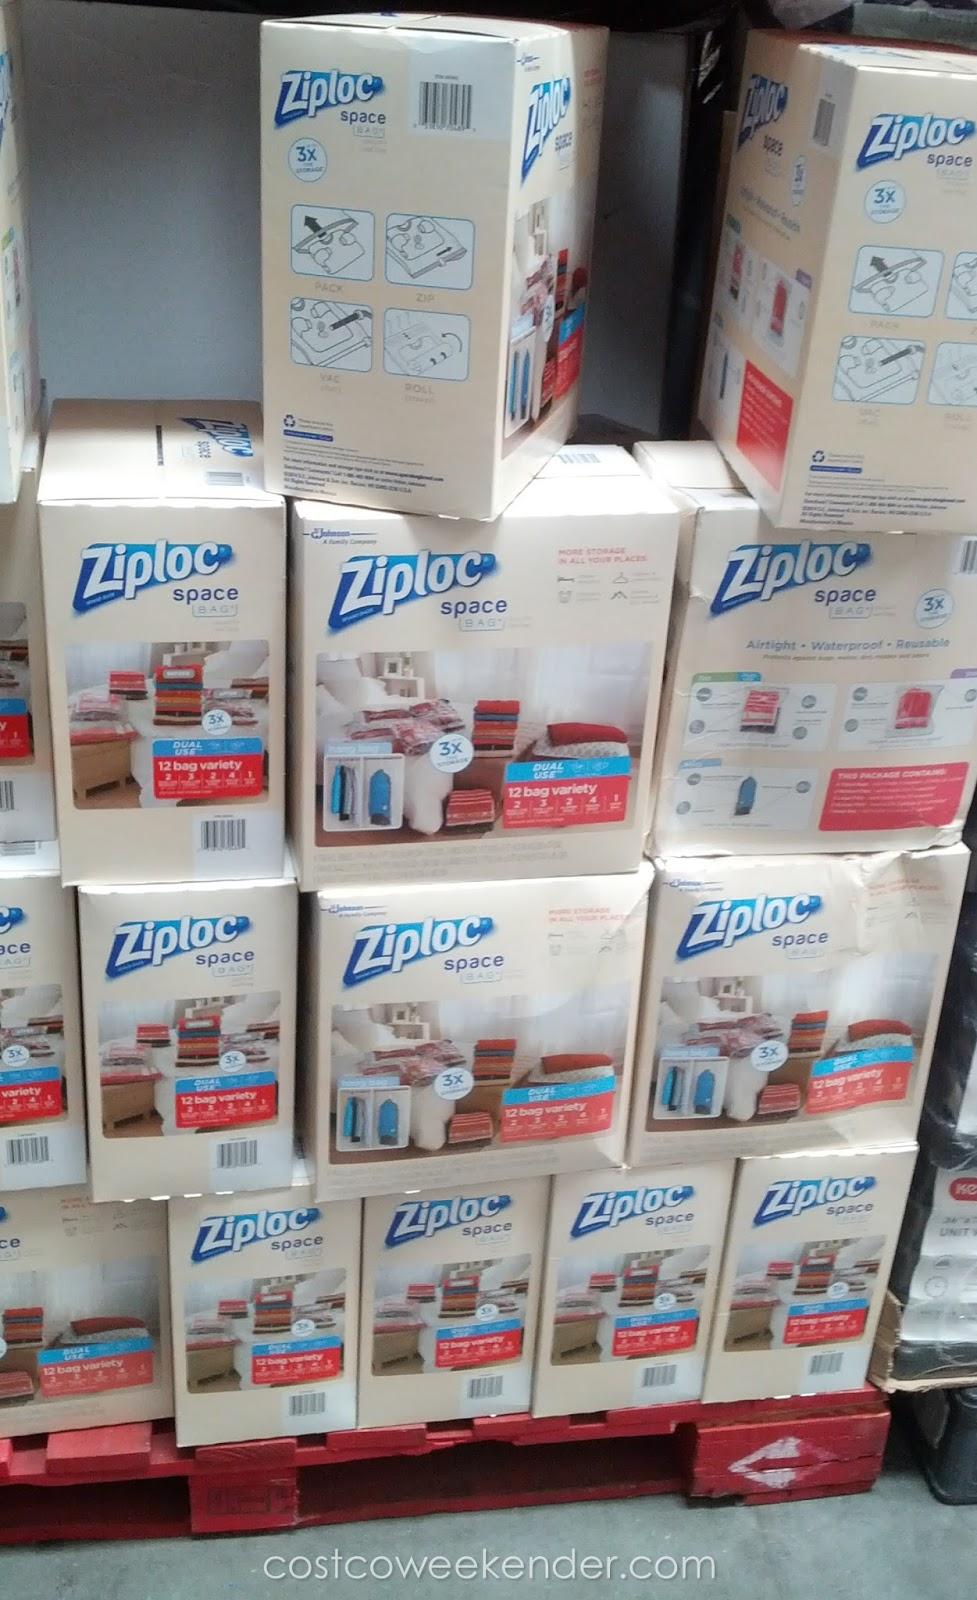 Ziploc Space Bag - Store clothing and bedding & Ziploc Space Bag (12 pc) | Costco Weekender